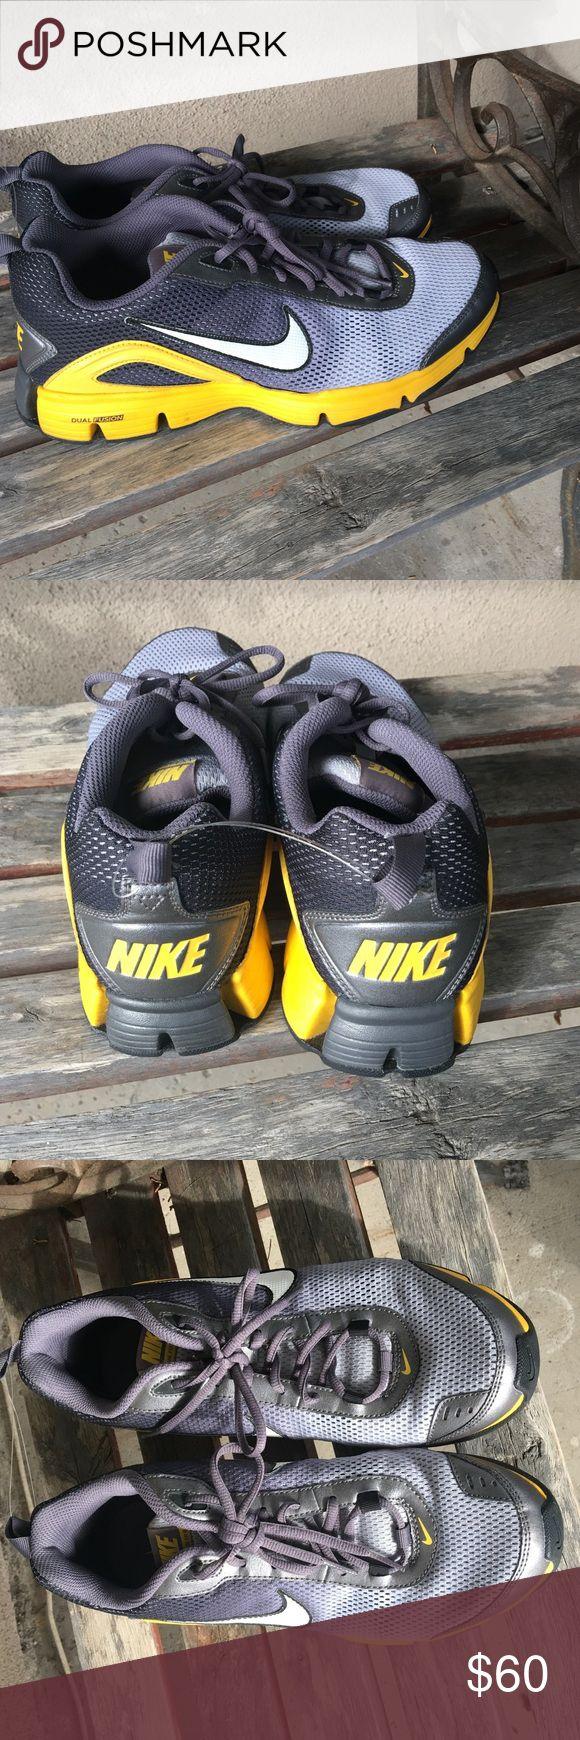 Nike dual fusion TR II size 9.5 Nike dual fusion TR II size 9.5.  Never worn, no box. Nike Shoes Sneakers